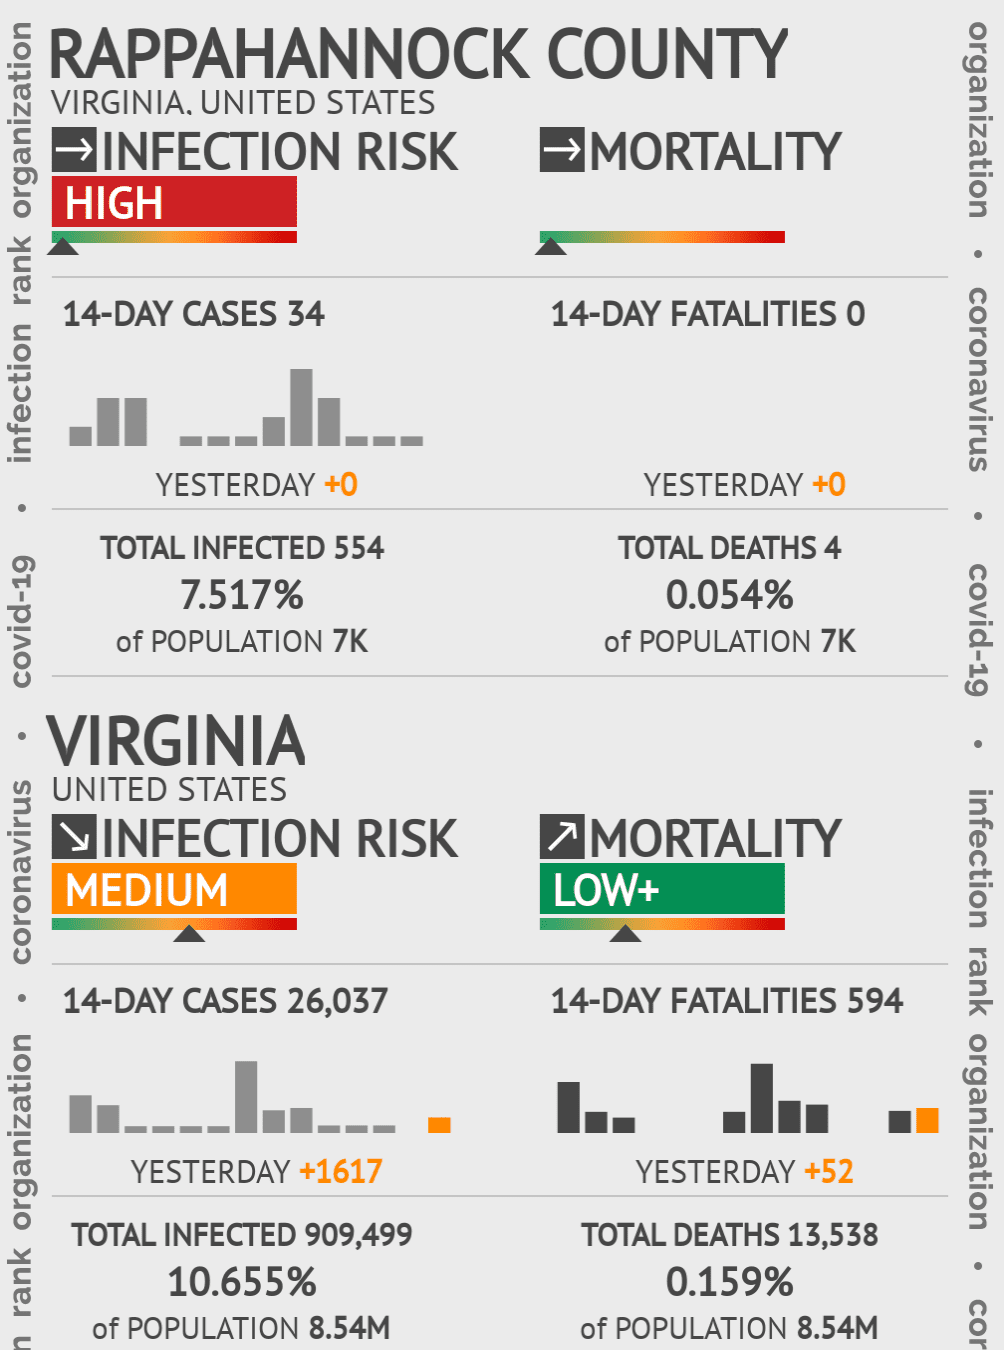 Rappahannock County Coronavirus Covid-19 Risk of Infection on July 24, 2021